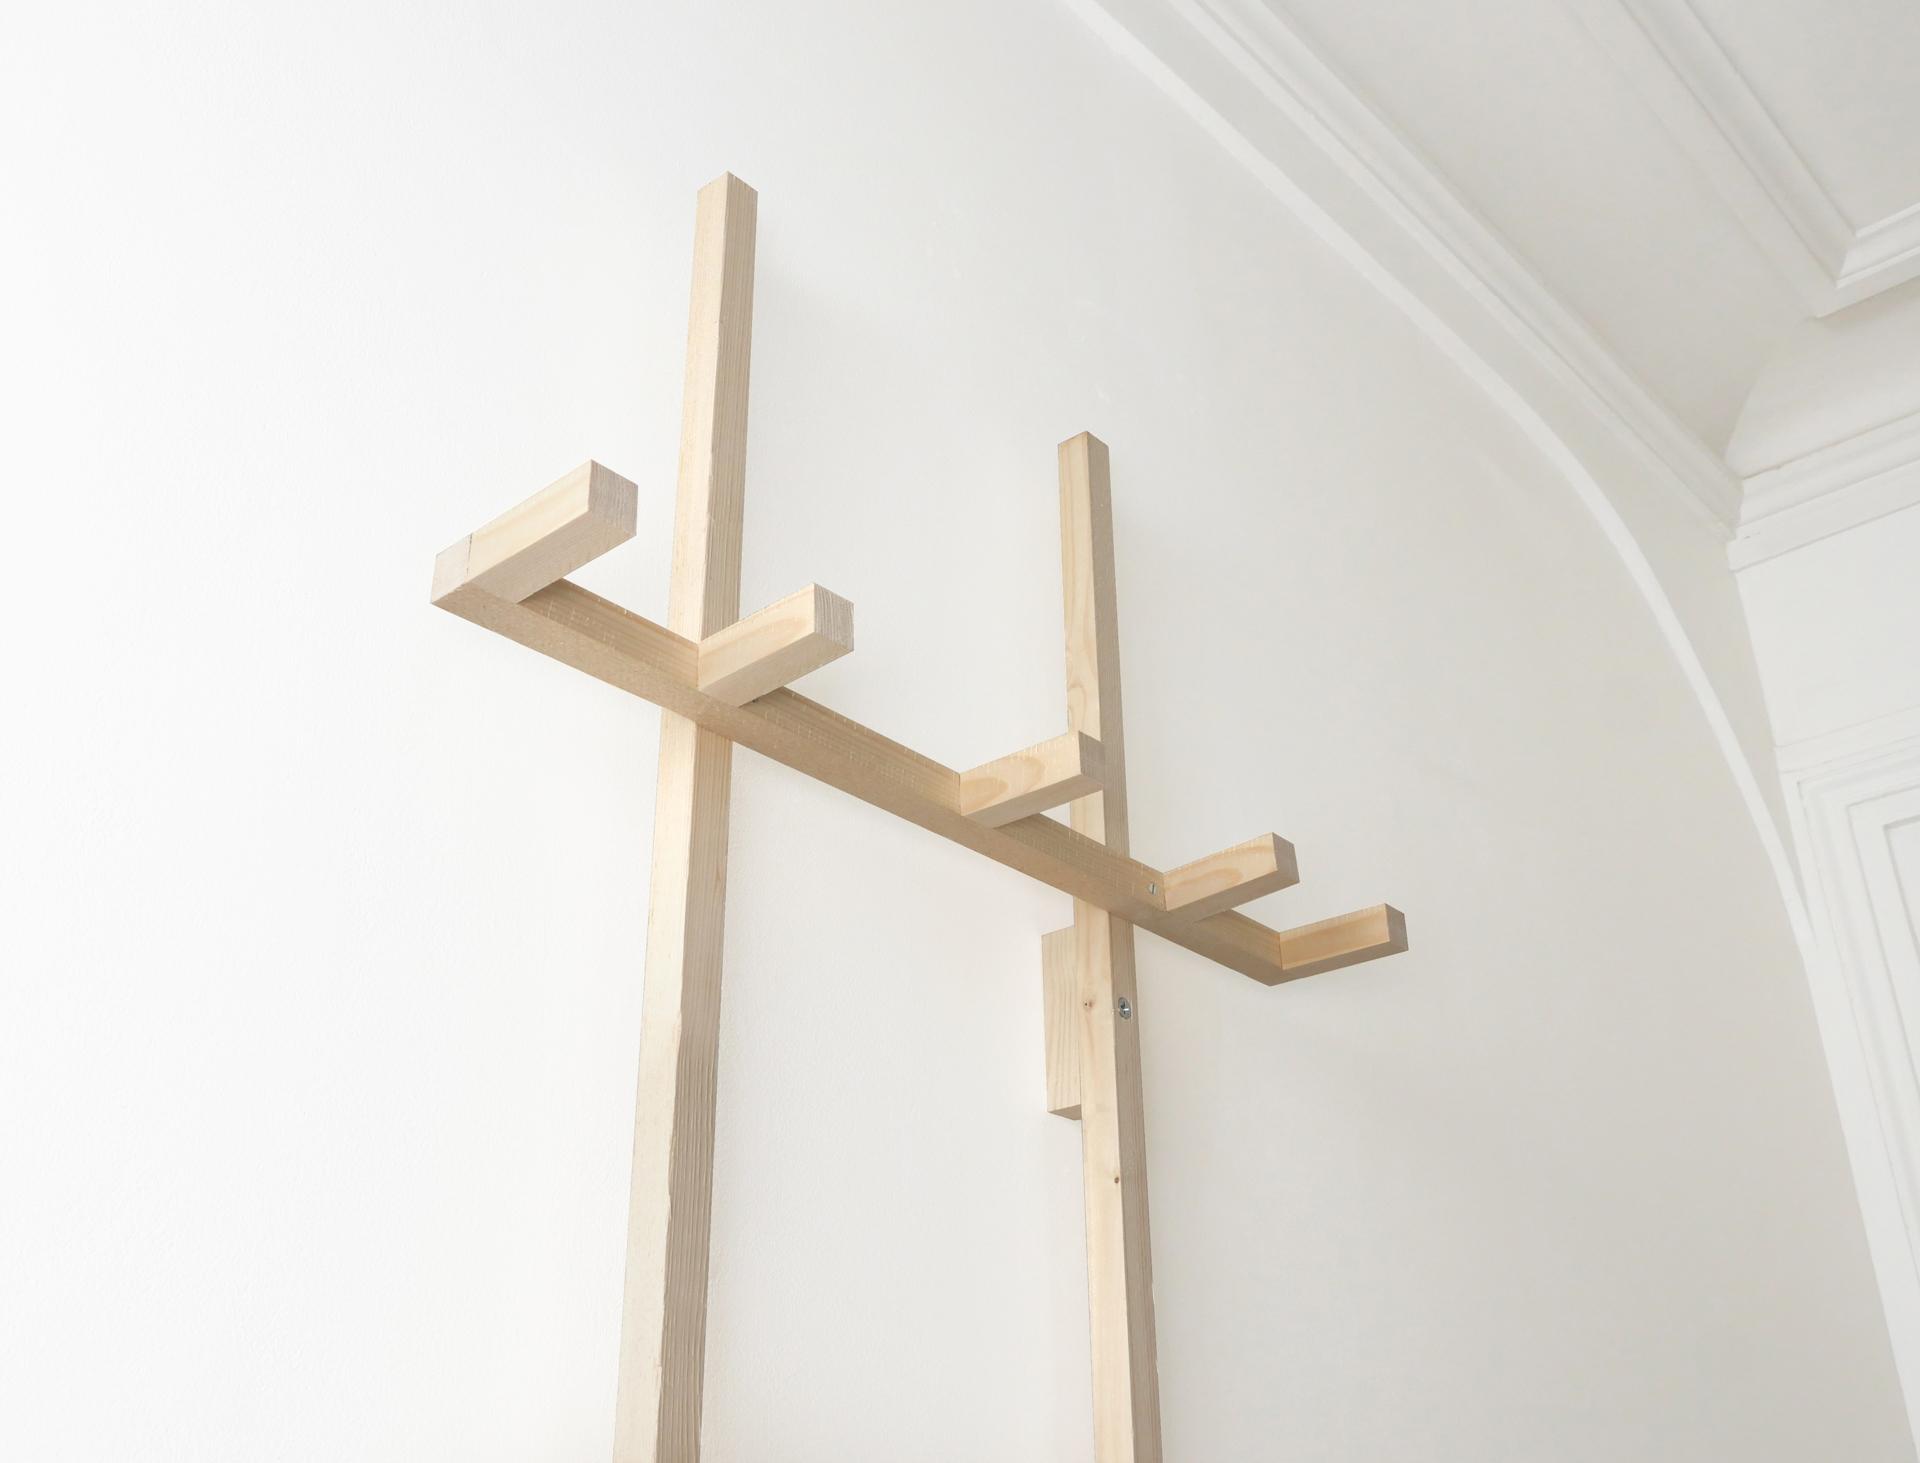 porte manteaux tag re pierre lota. Black Bedroom Furniture Sets. Home Design Ideas